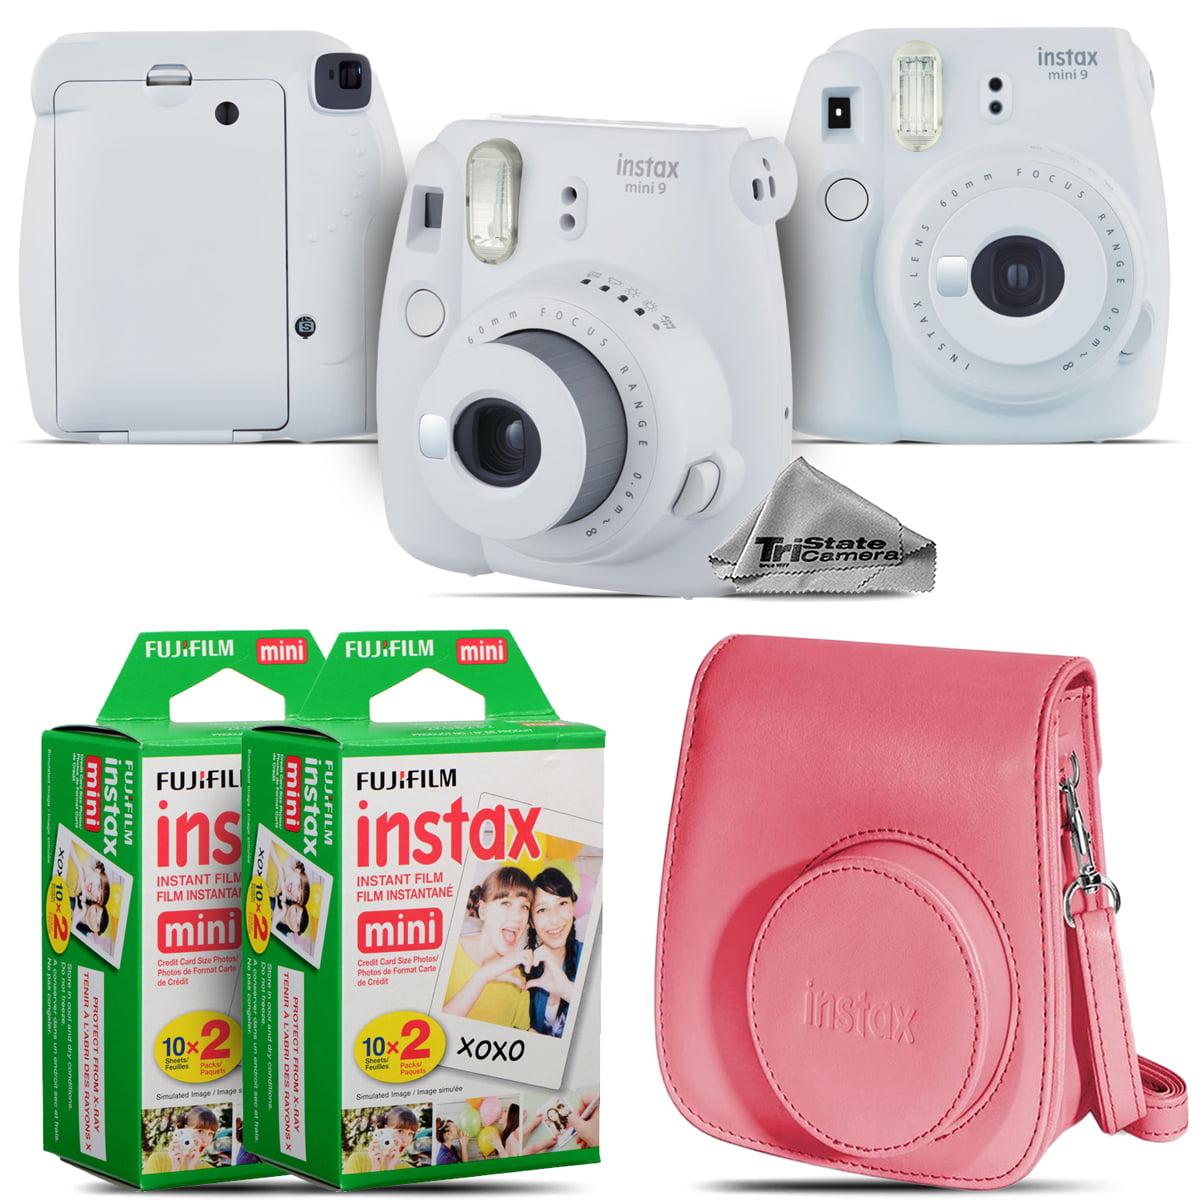 FujiFilm instax mini 9 Film Camera (Smokey White) + Pink Case 40 Films Kit by Tri State Camera